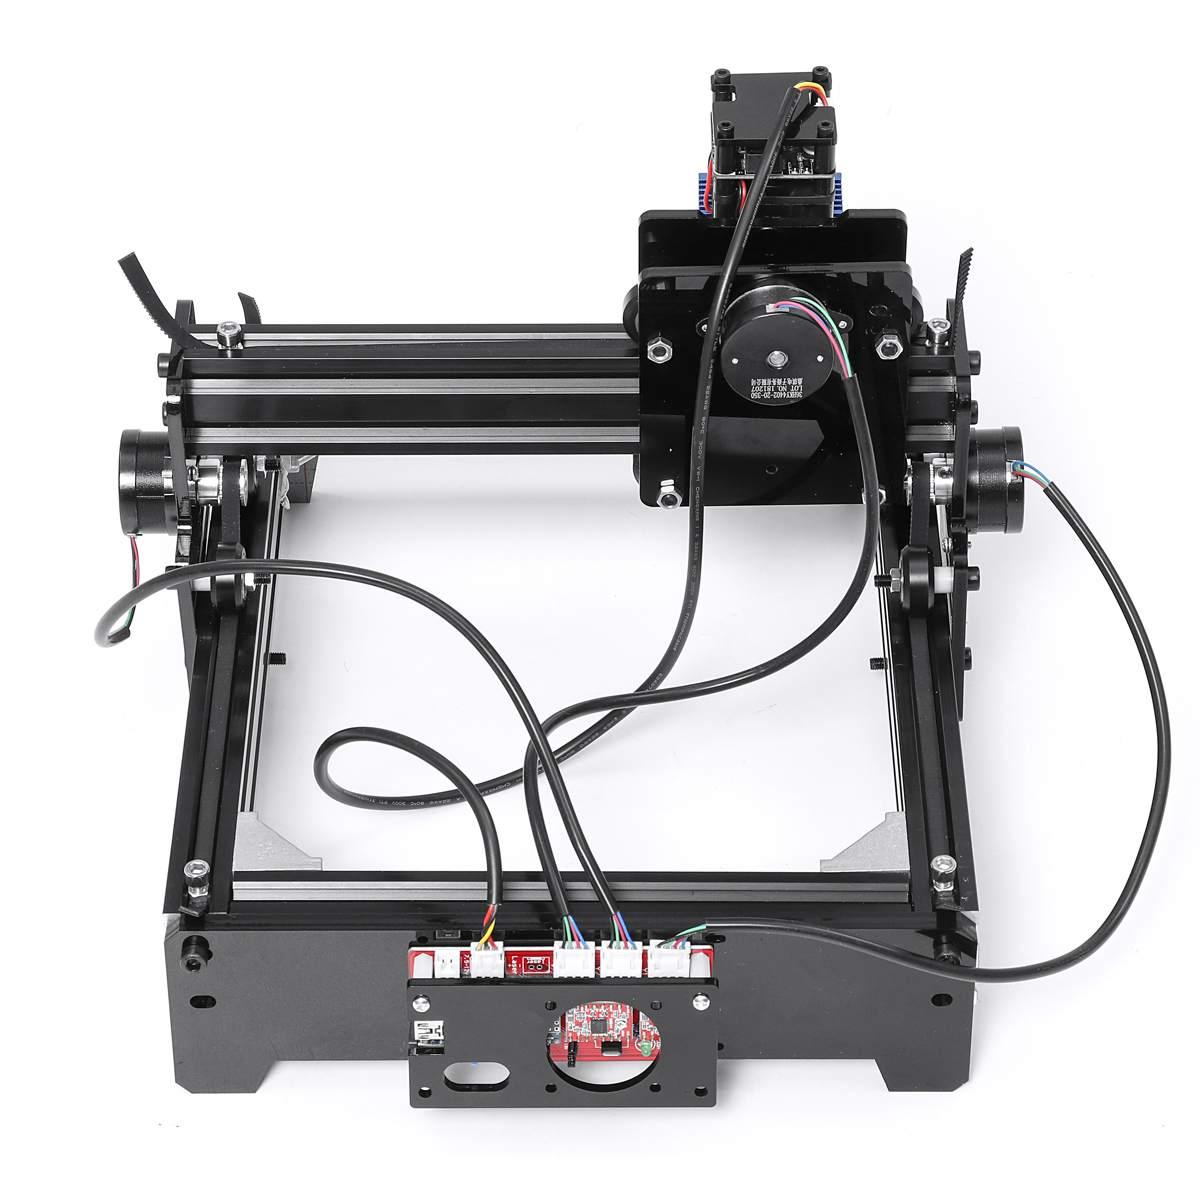 20*14CM 12W Laser Engraving Machine DC 12V Metal Marking Engraver Home DIY  Printer Cutter Support Windows 7 8 10 System